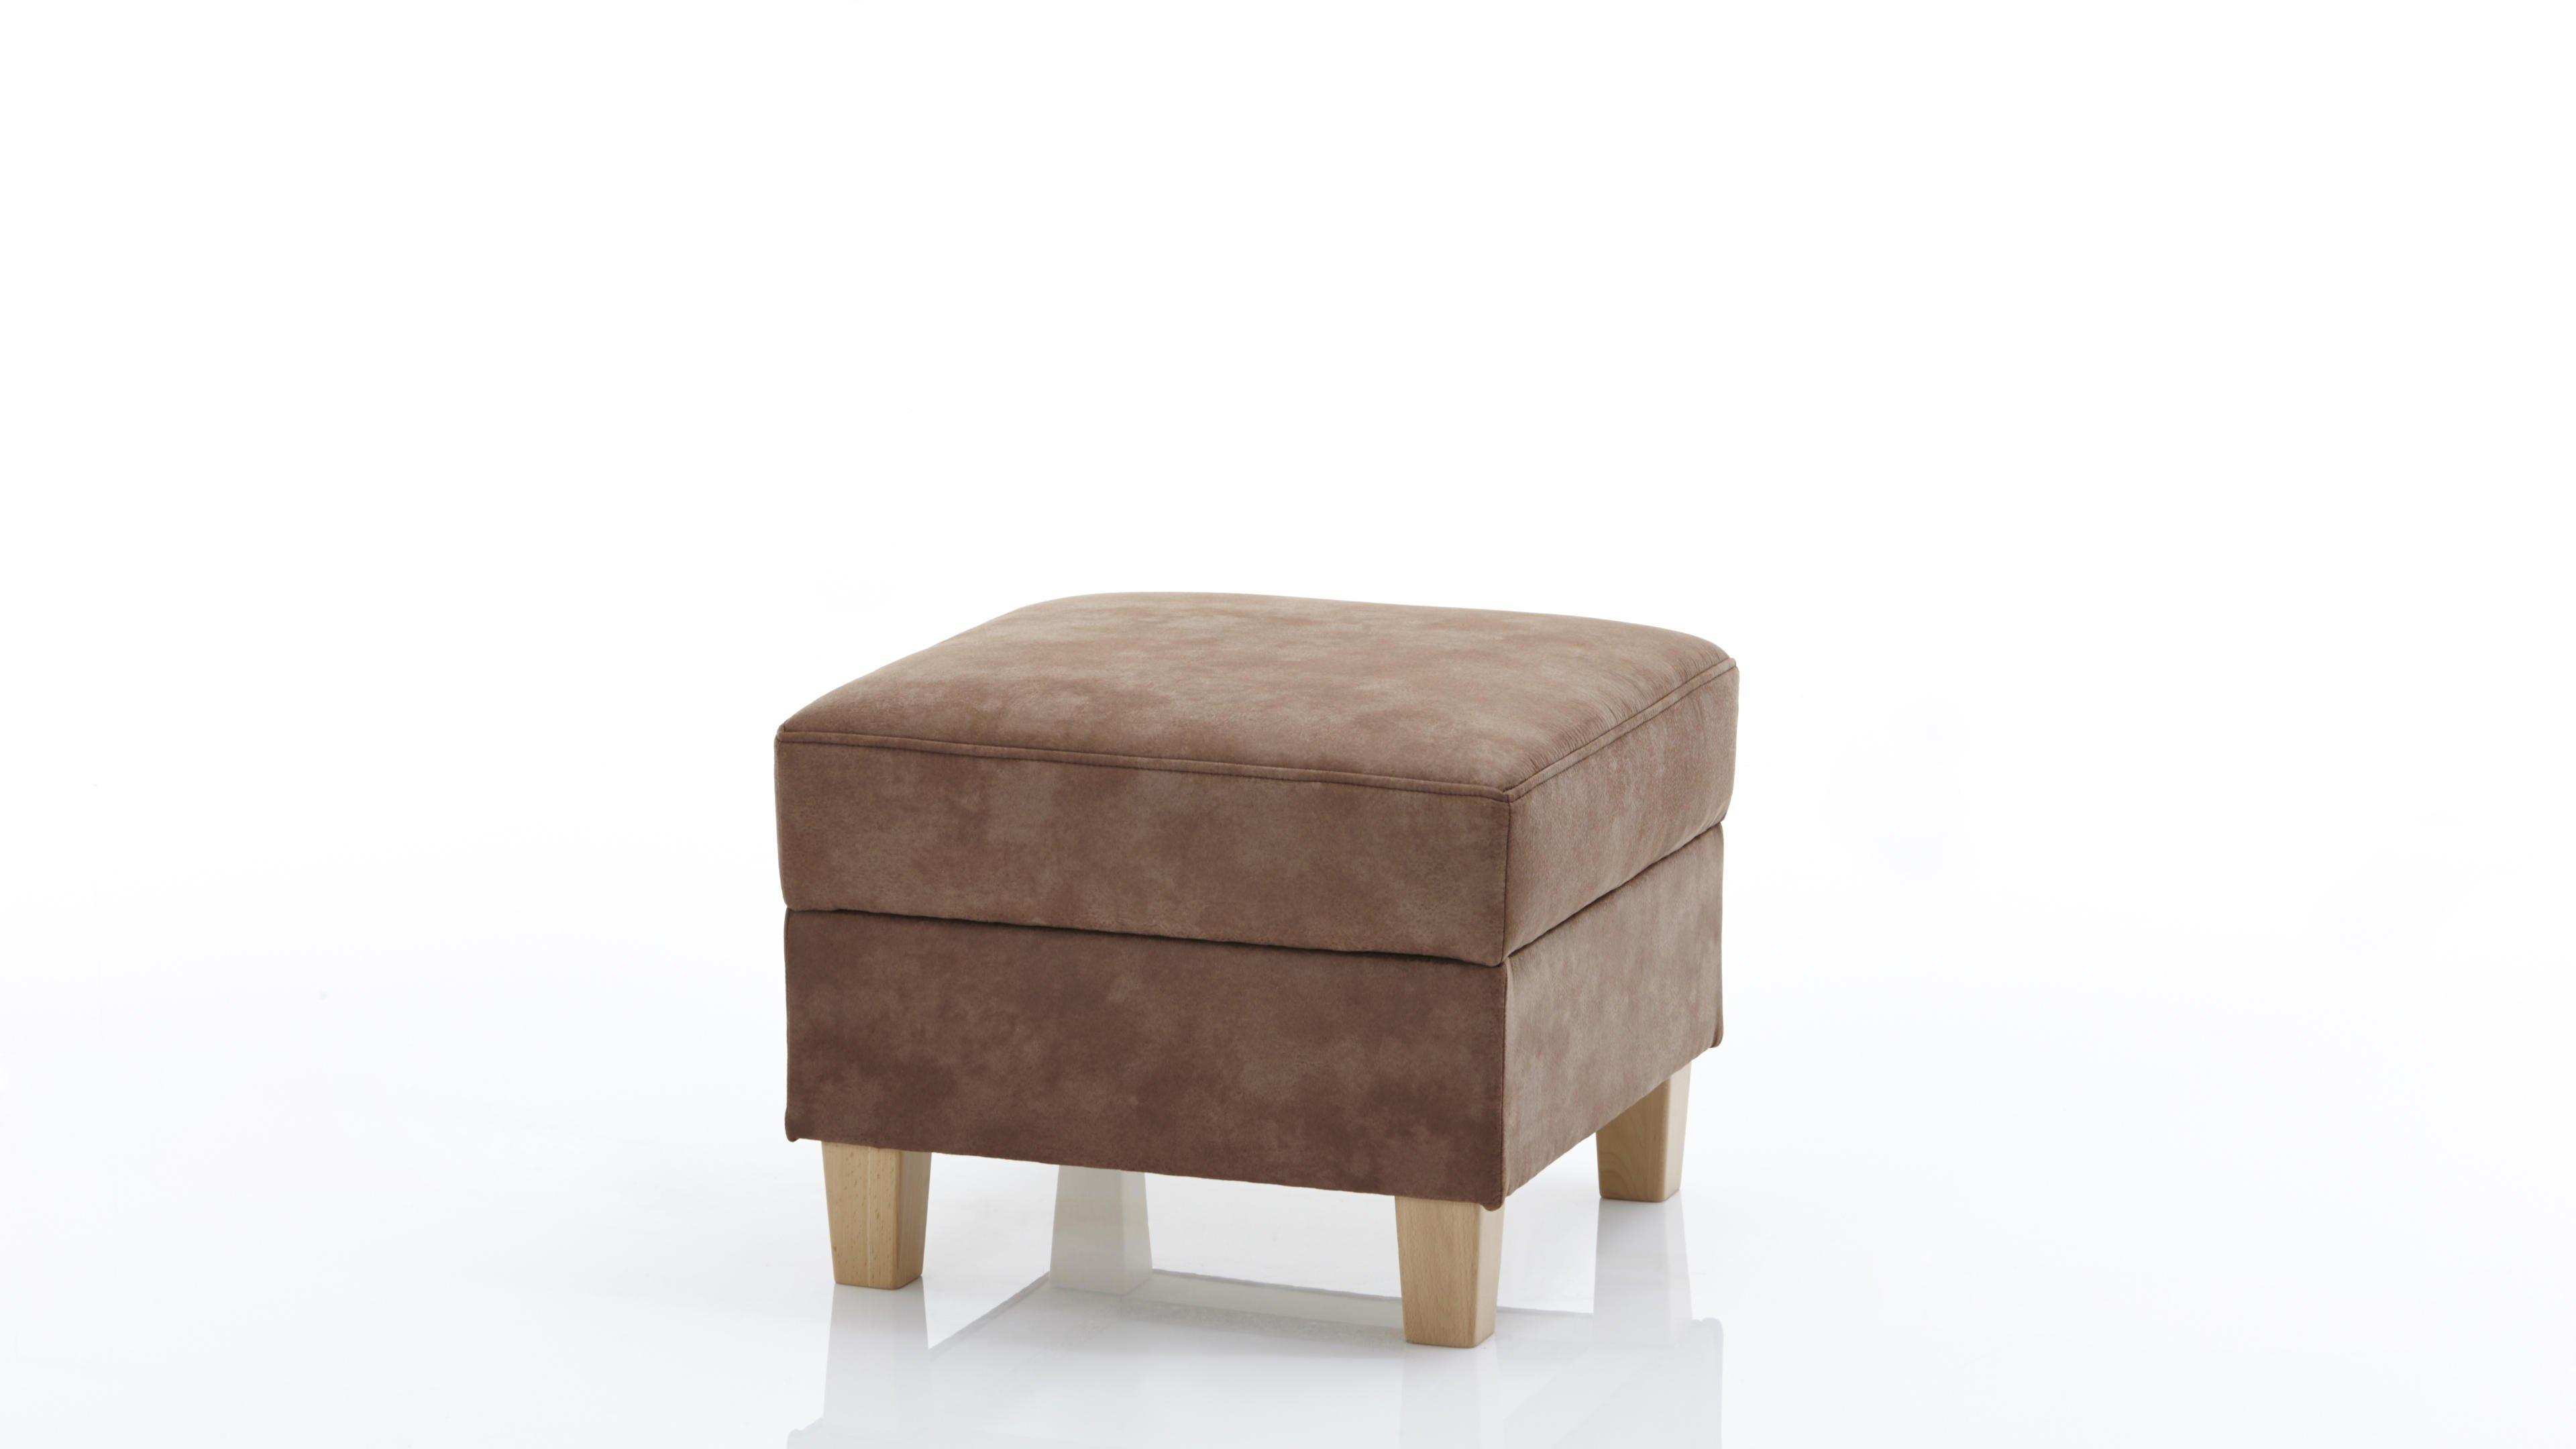 Hocker Else Plus Holz/Buche,Kunstfaser (Chemiefaser),Leder